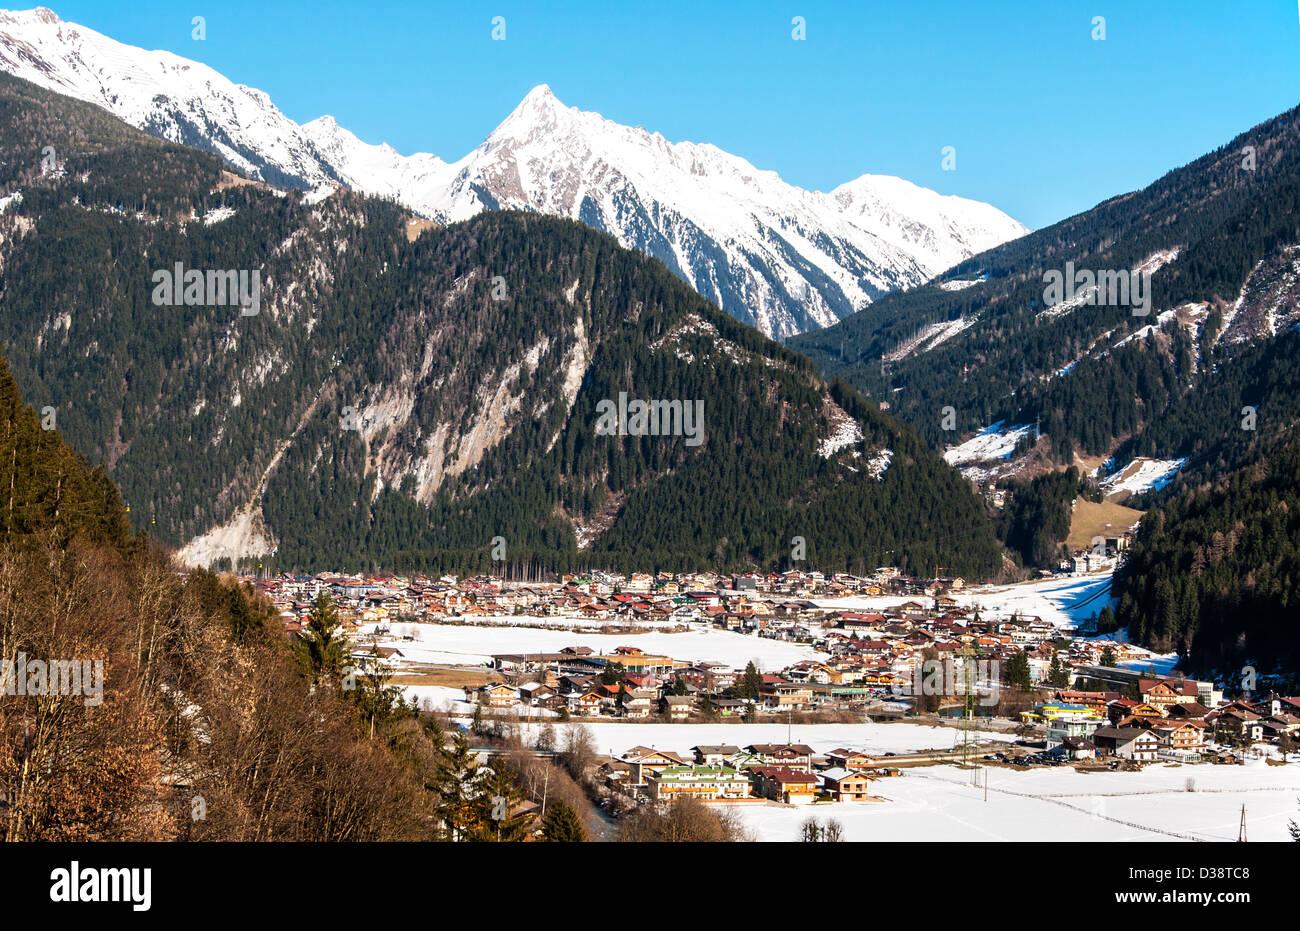 Mayrhofen ski resort in Zillertal Alps in Austria - Stock Image